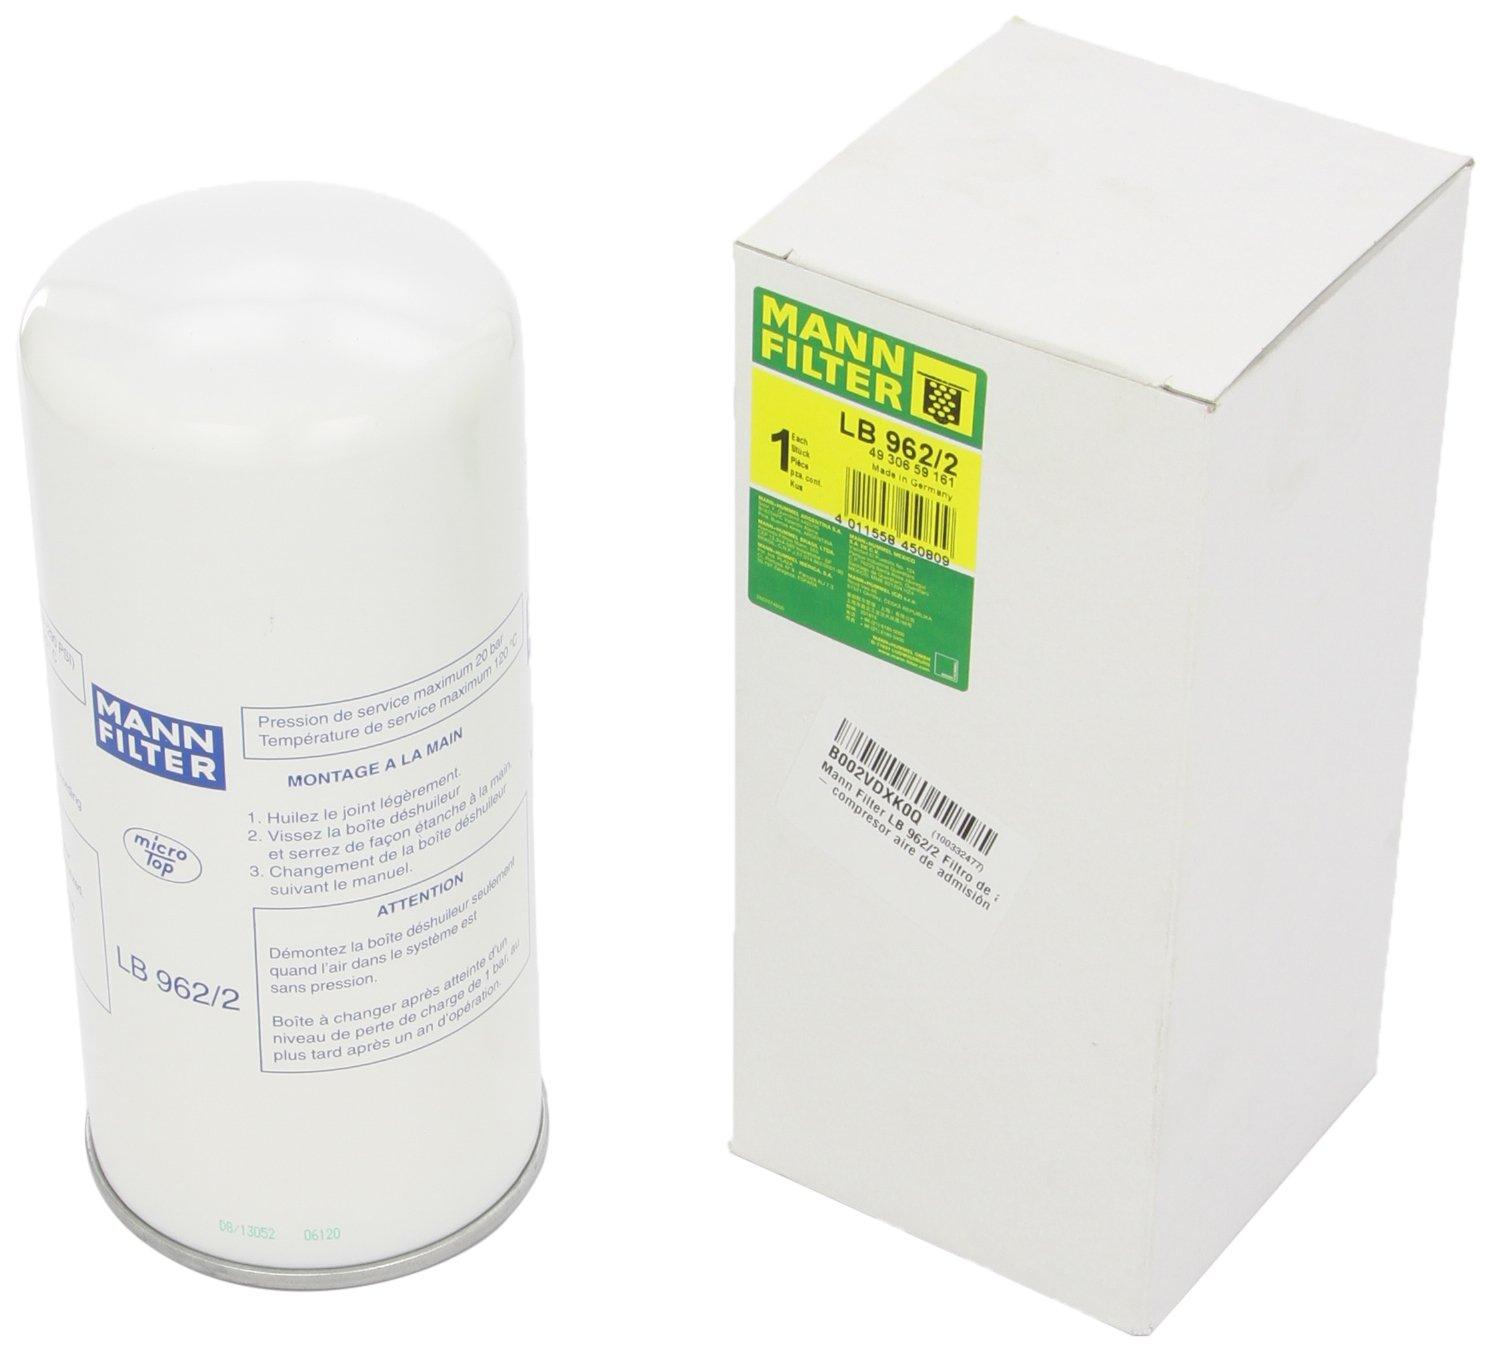 Mann Filter LB9622 Filter